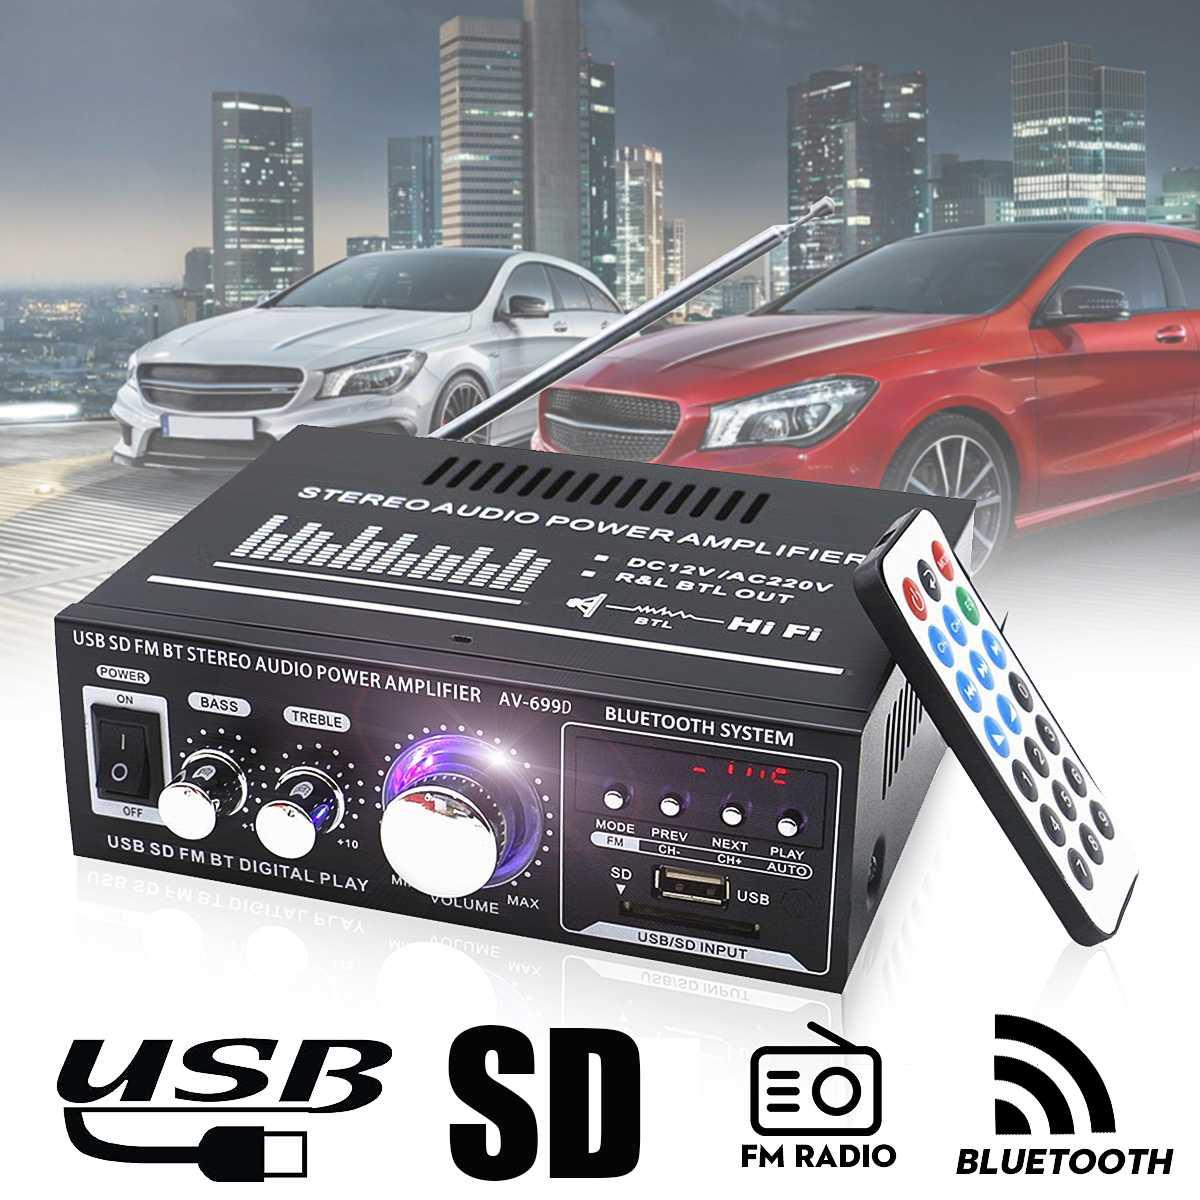 12V/220V 400W 2 CH Bluetooth Car HiFi Stereo Amplifier USB SD FM Radio Power Stereo Car Am